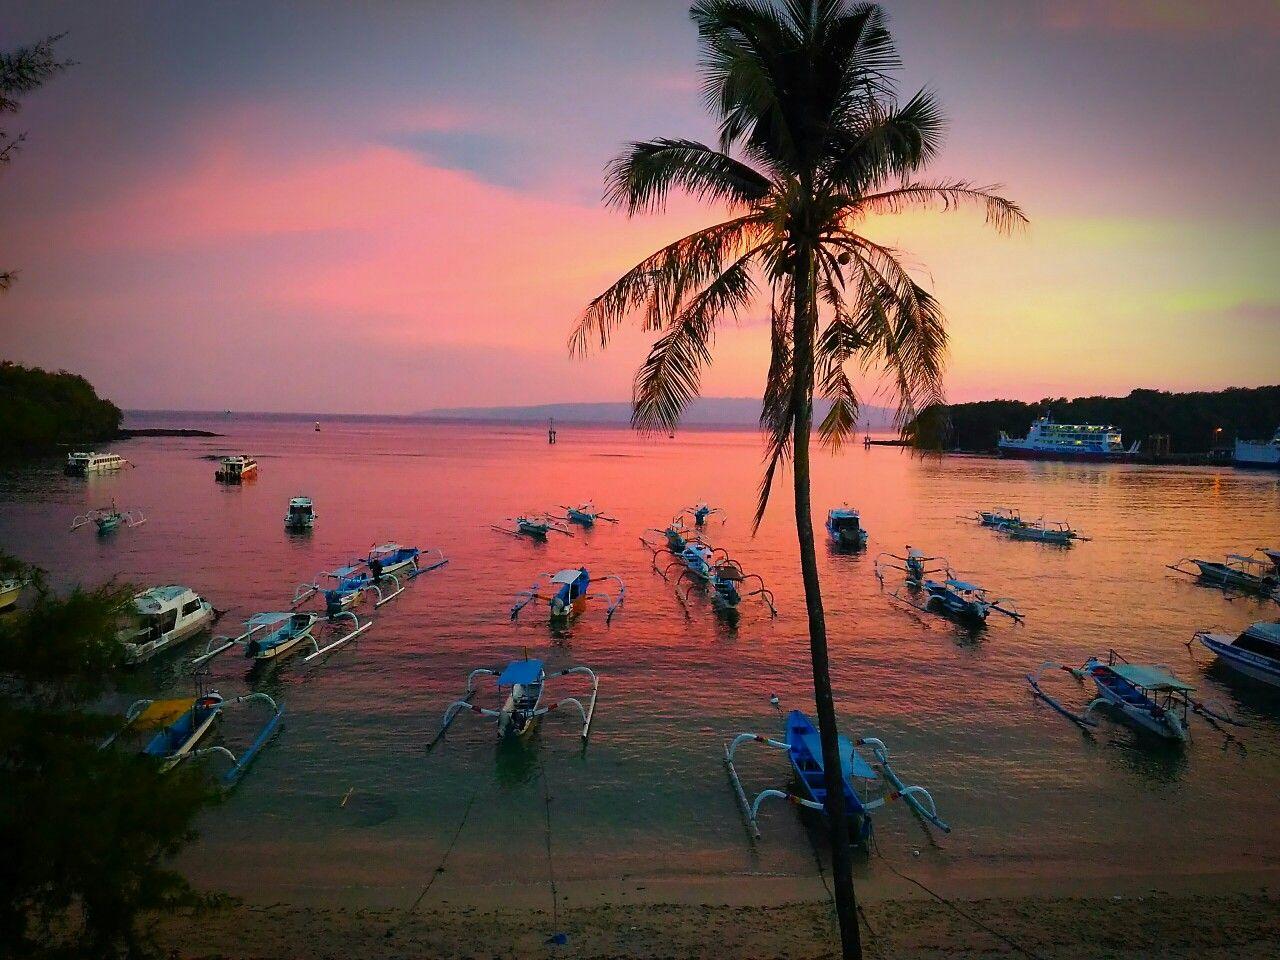 Sunset Padangbai Bali Is Very Spiritual Like A Dream Painting Bali Beaches Bali East Coast